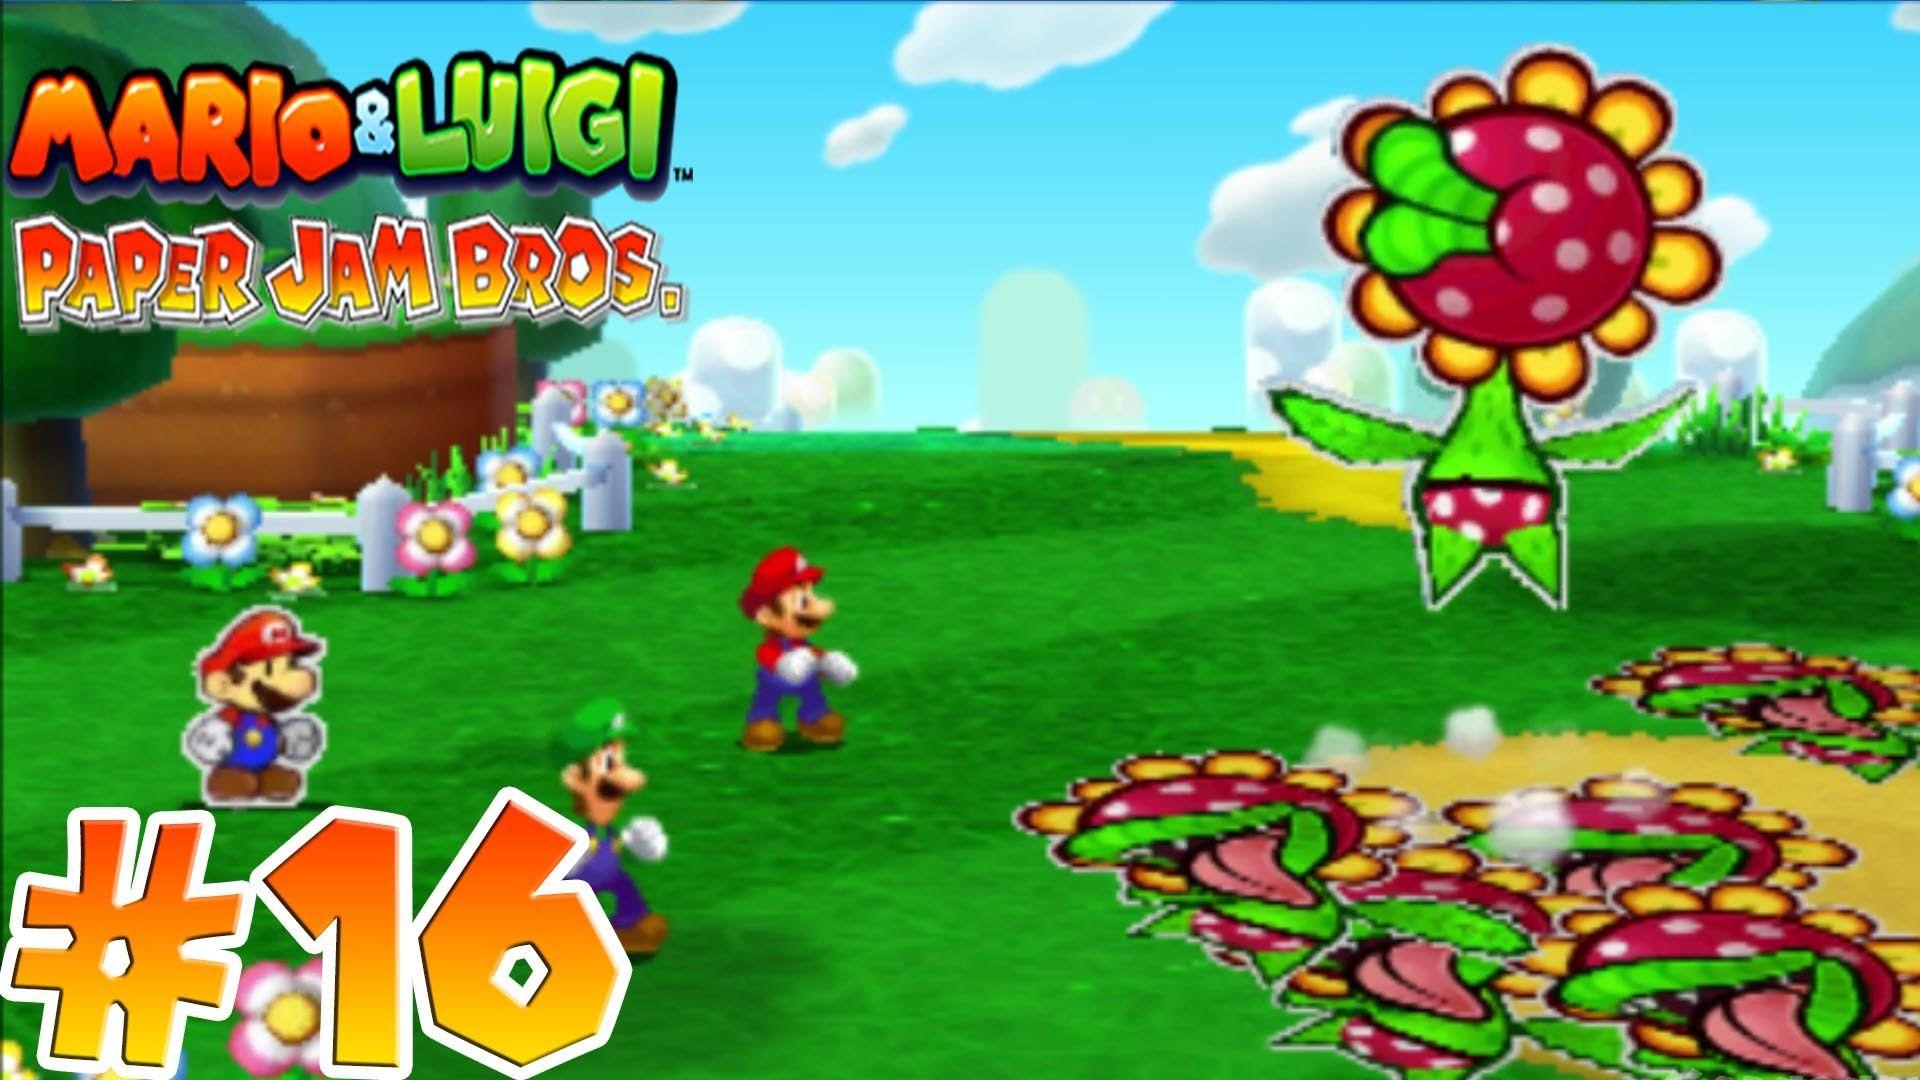 Mario Luigi Paper Jam Bros Gameplay Walkthrough Part 16